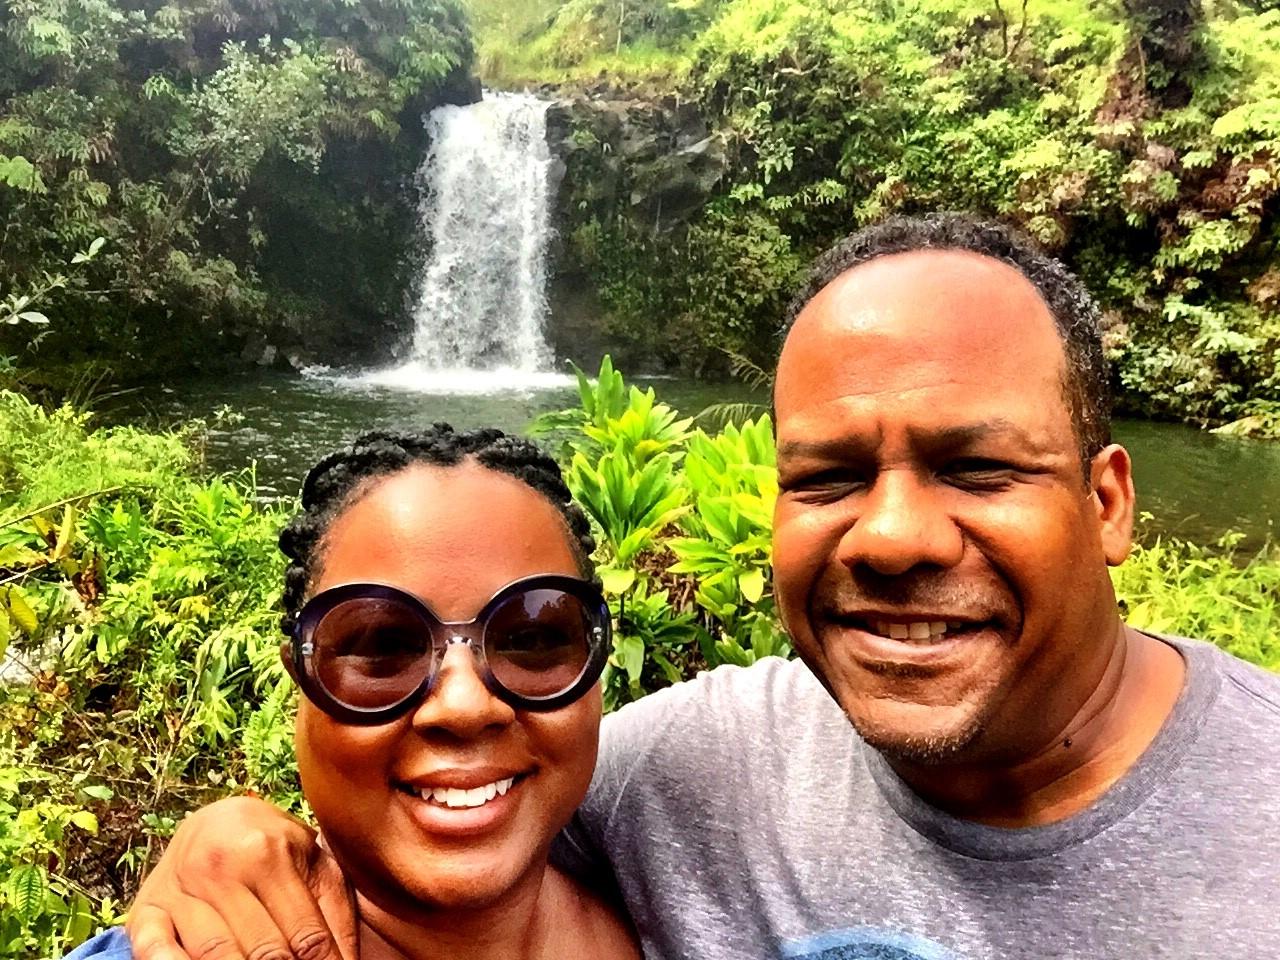 Road to Hana Stops | James and Tomiko at a waterfall